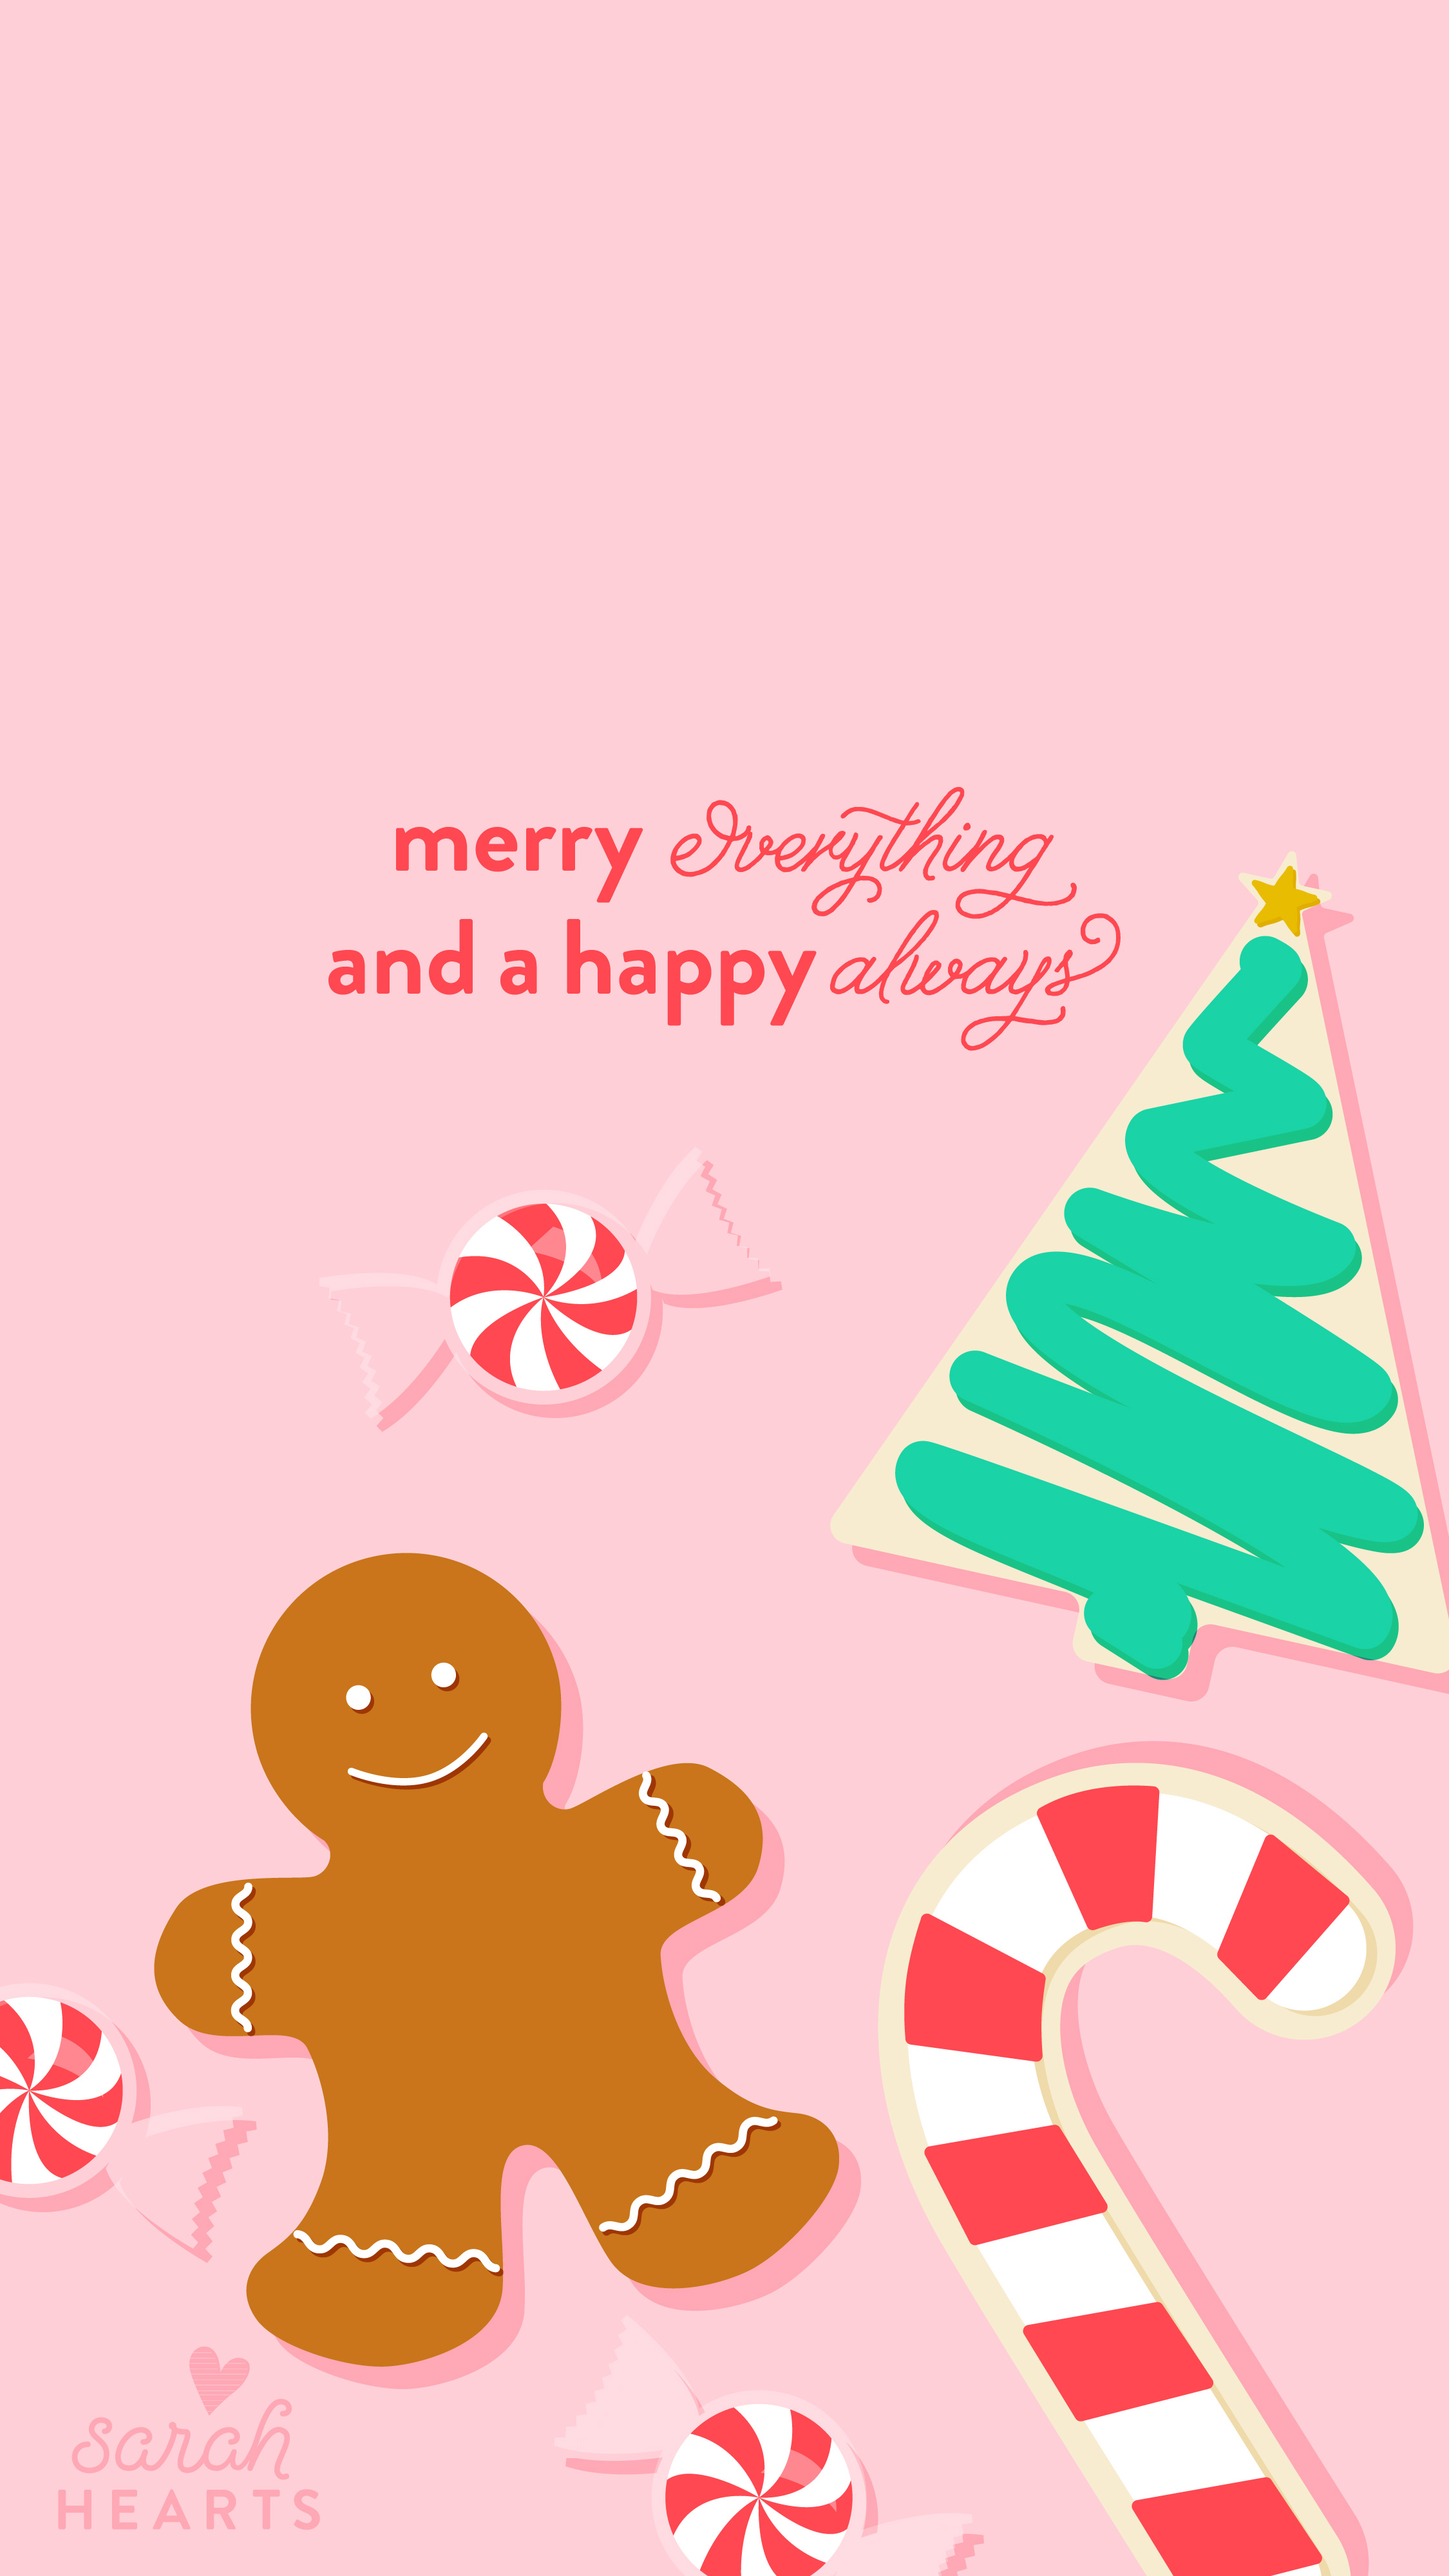 Download Cute Wallpapers For My Phone December 2016 Christmas Cookie Calendar Wallpaper Sarah